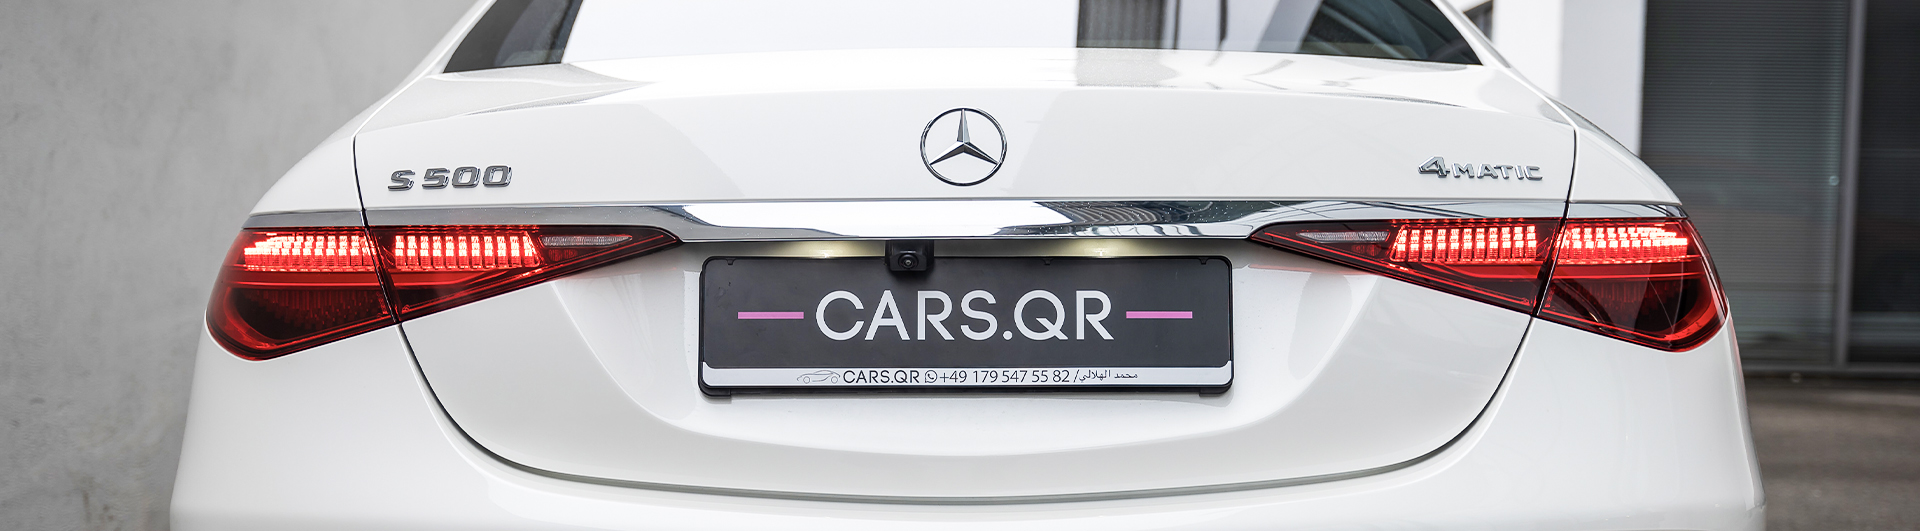 CarsQR-1